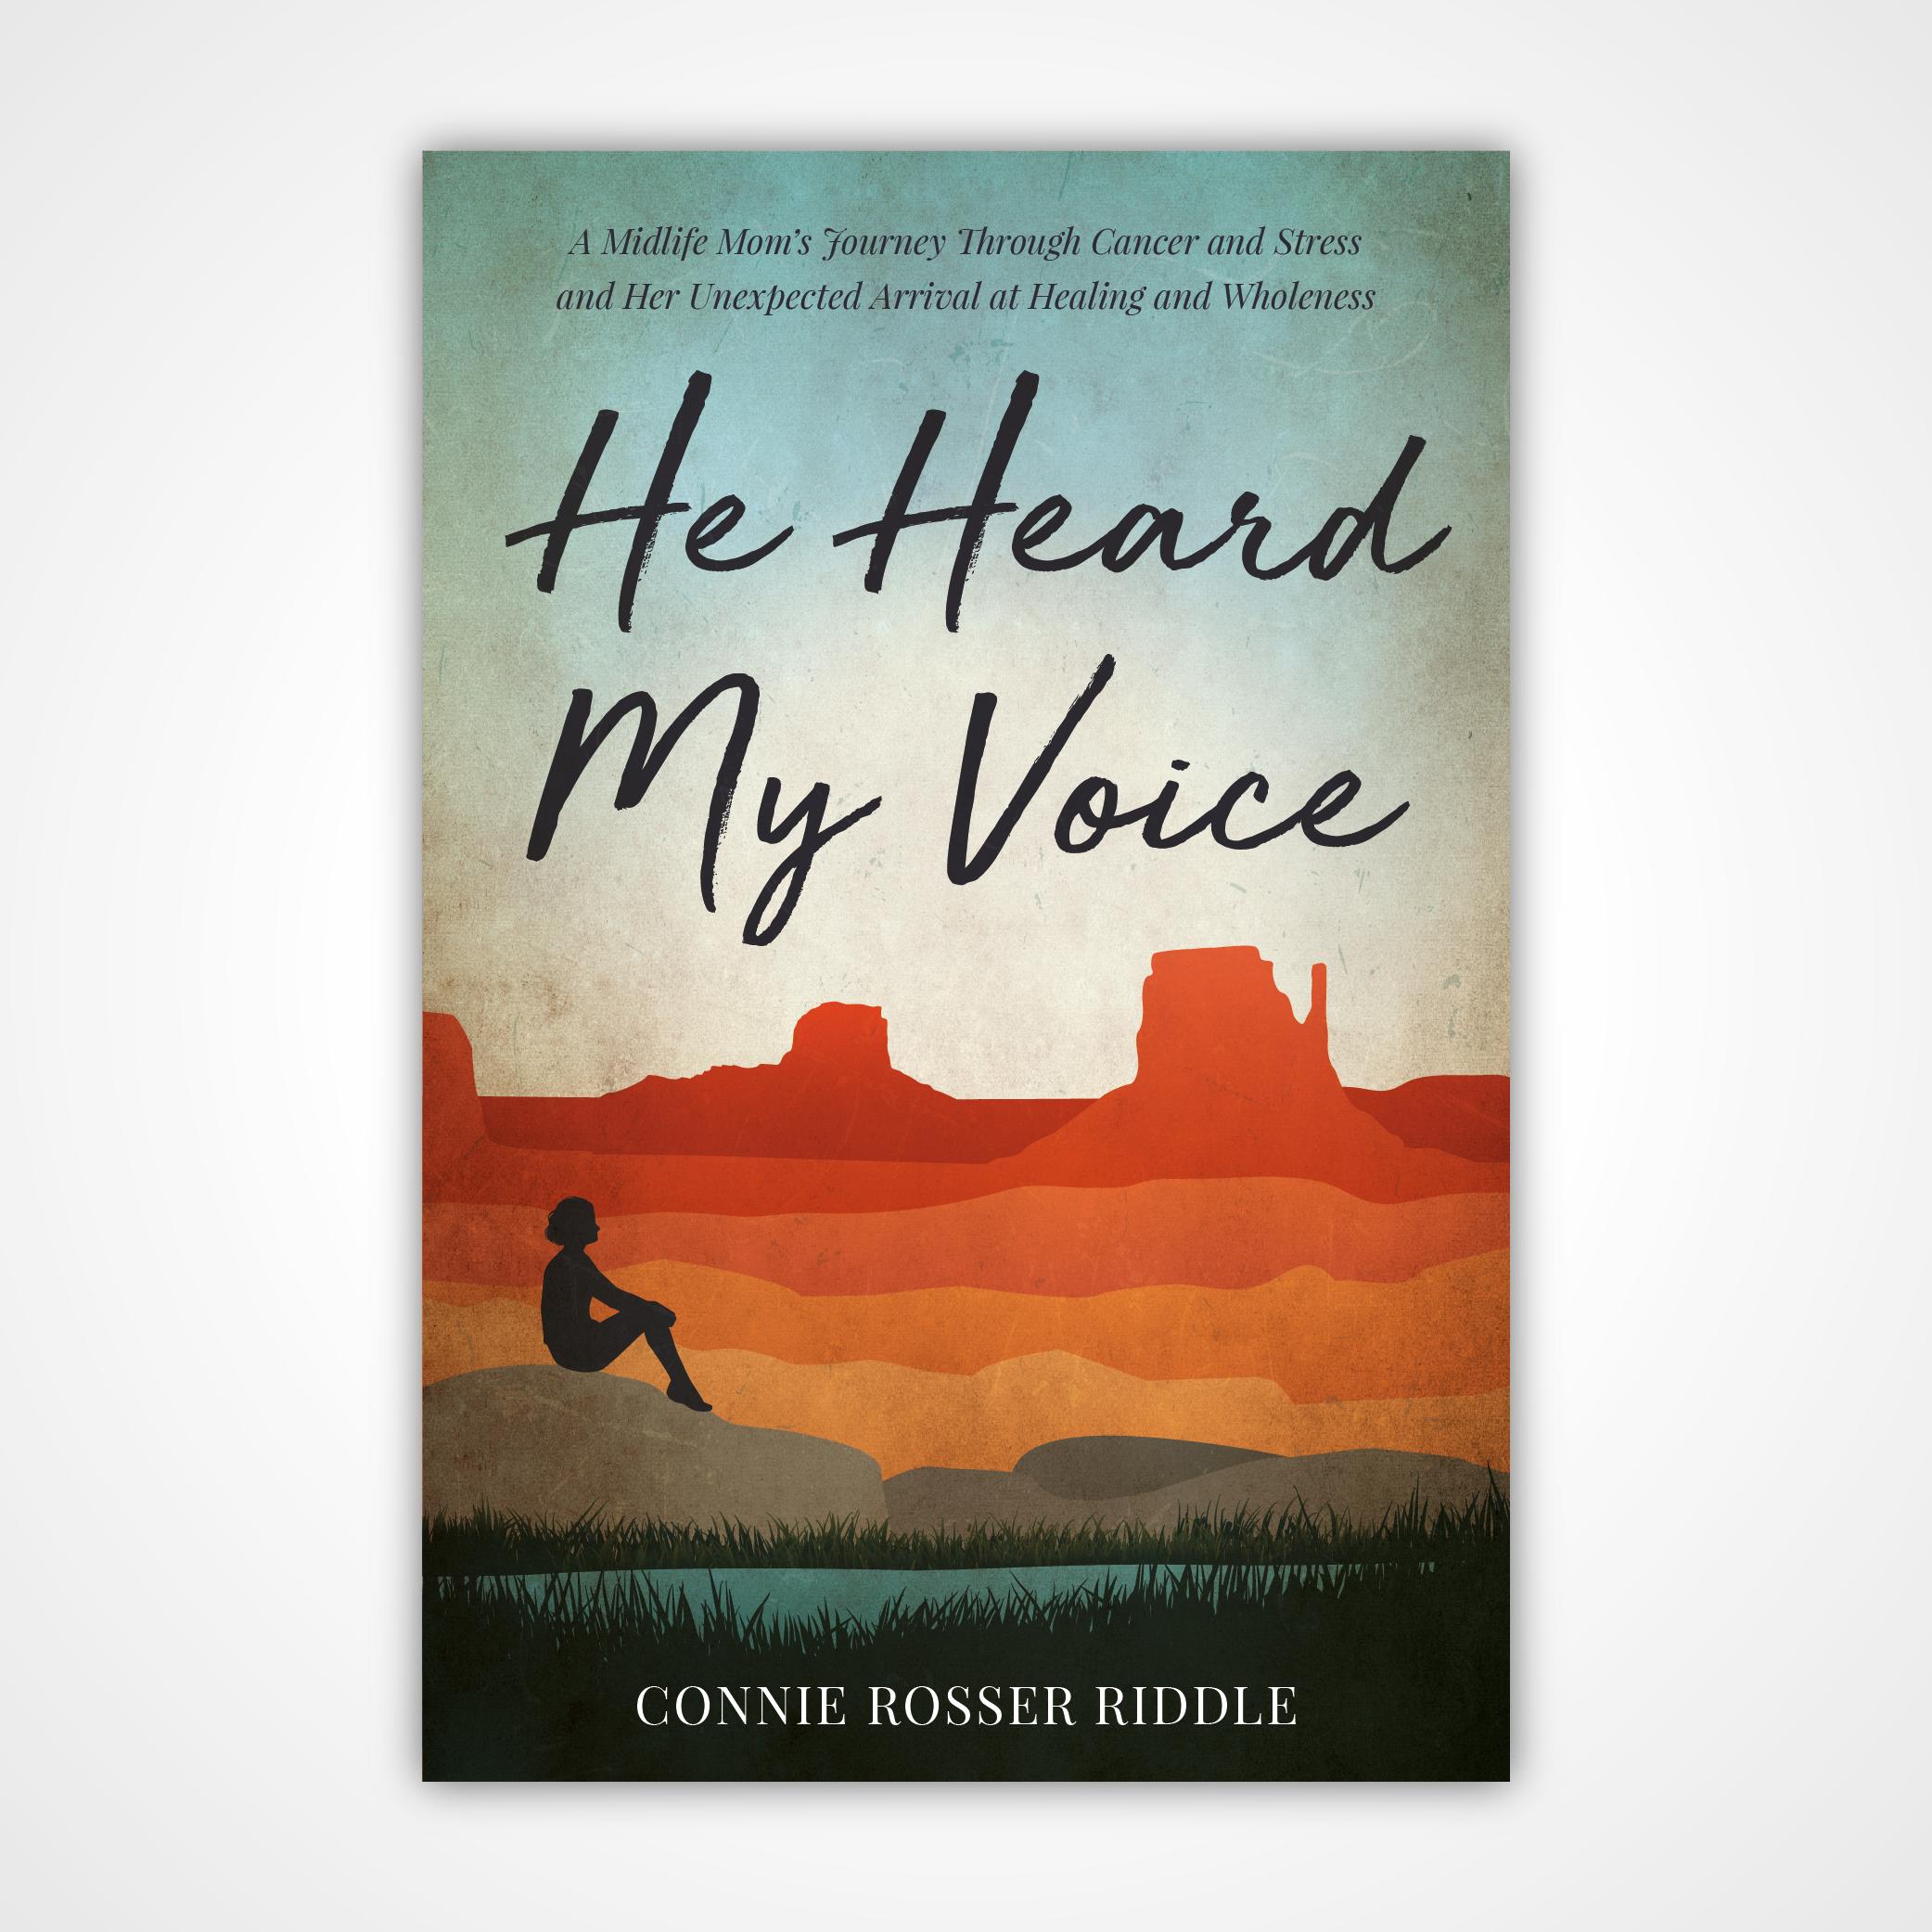 Create a Paperback Book Cover for an Inspirational Memoir for Women